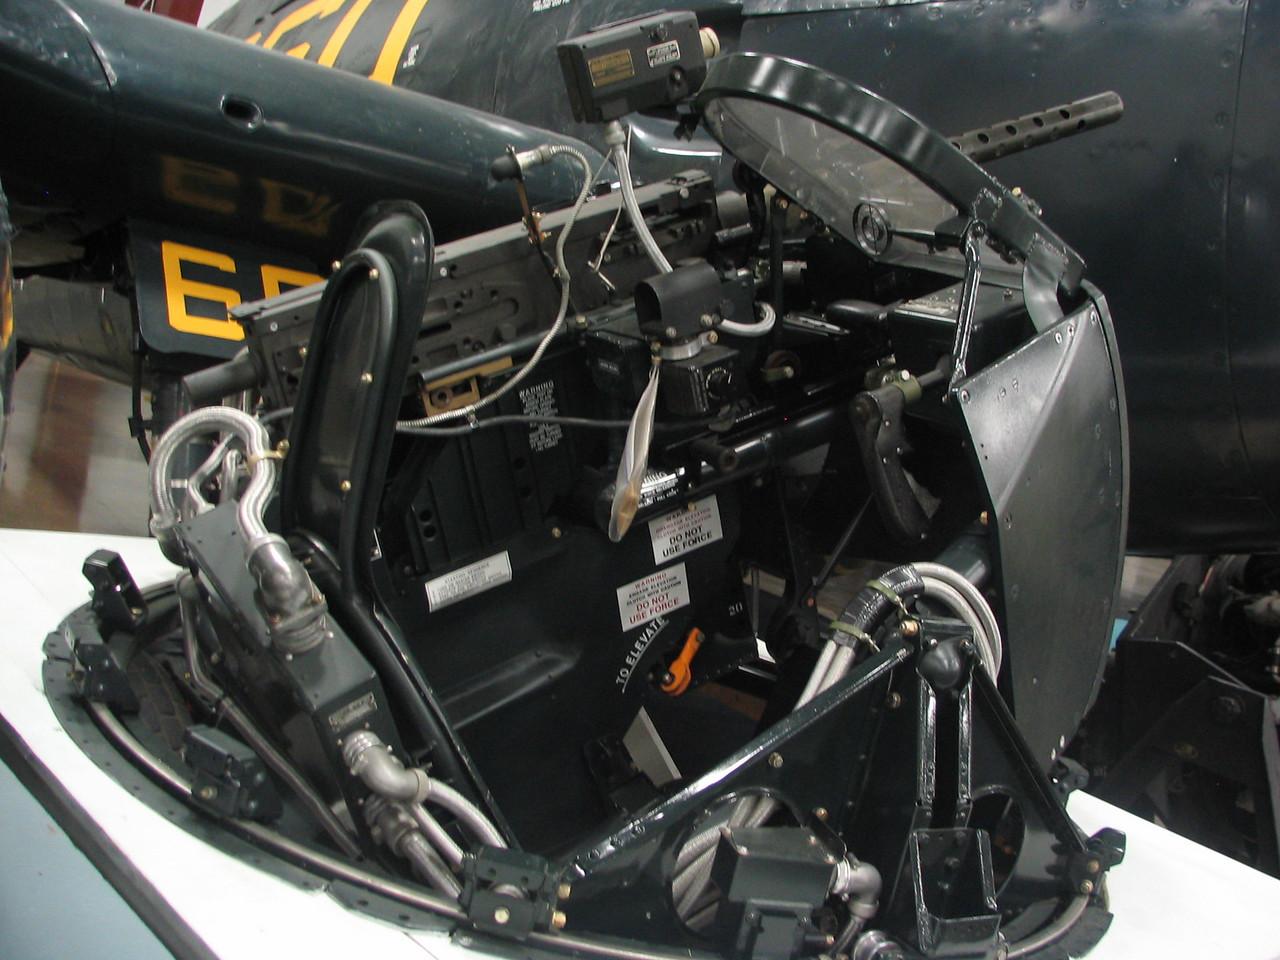 Grumman TBF-1 Turret